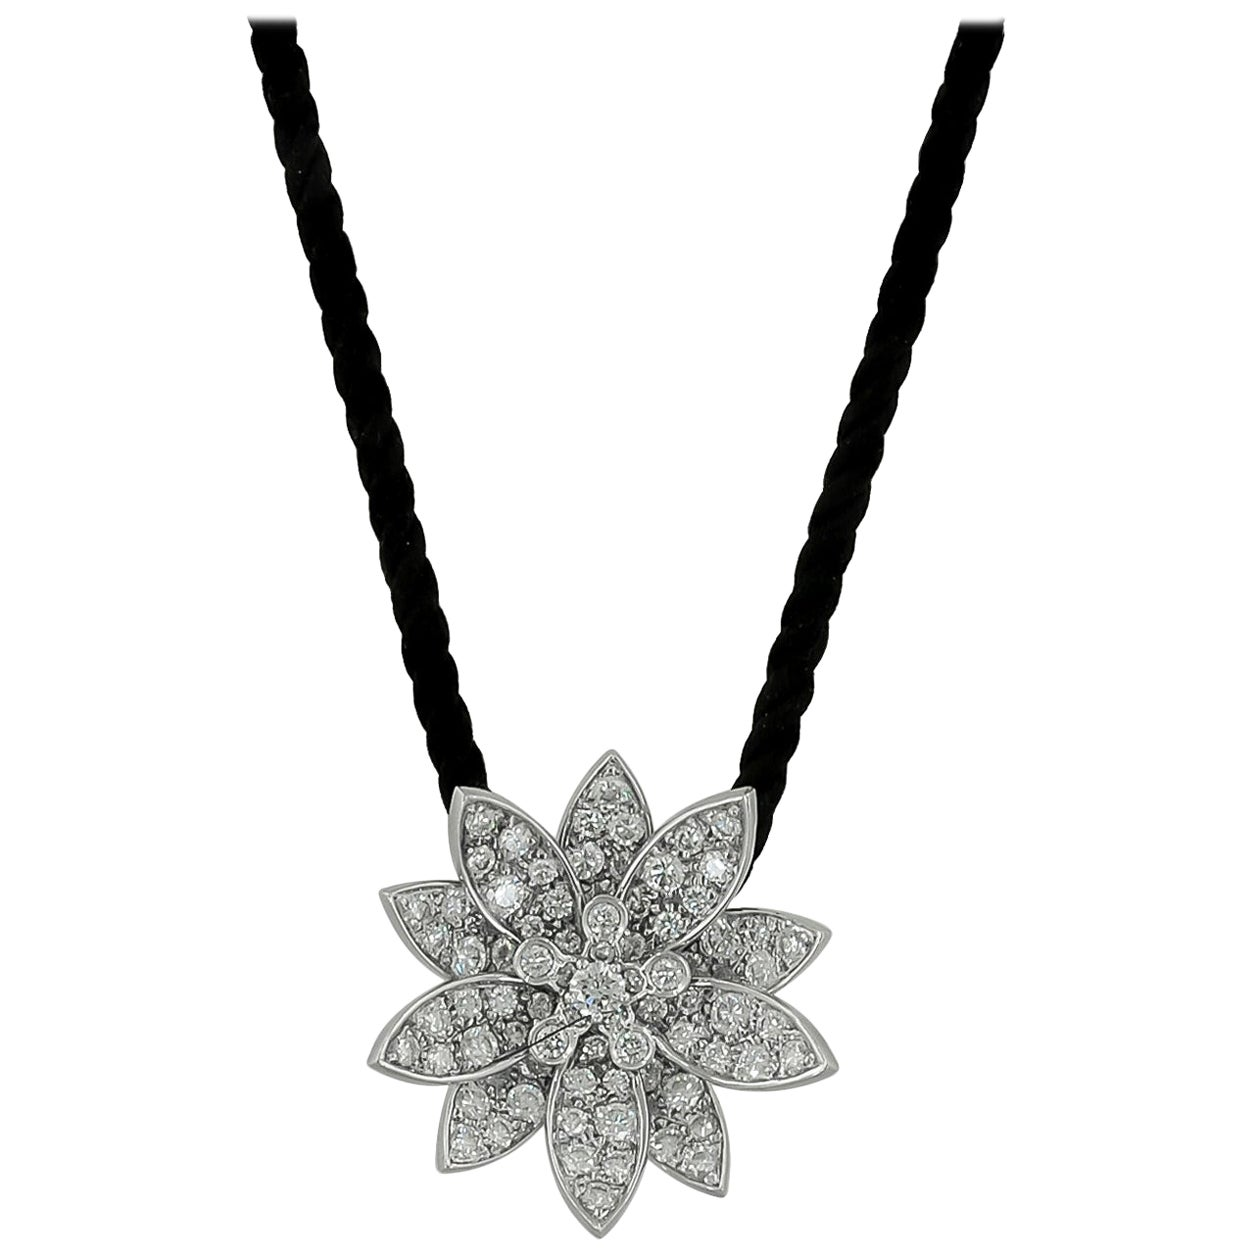 Van Cleef & Arpels Diamond Lotus Necklace